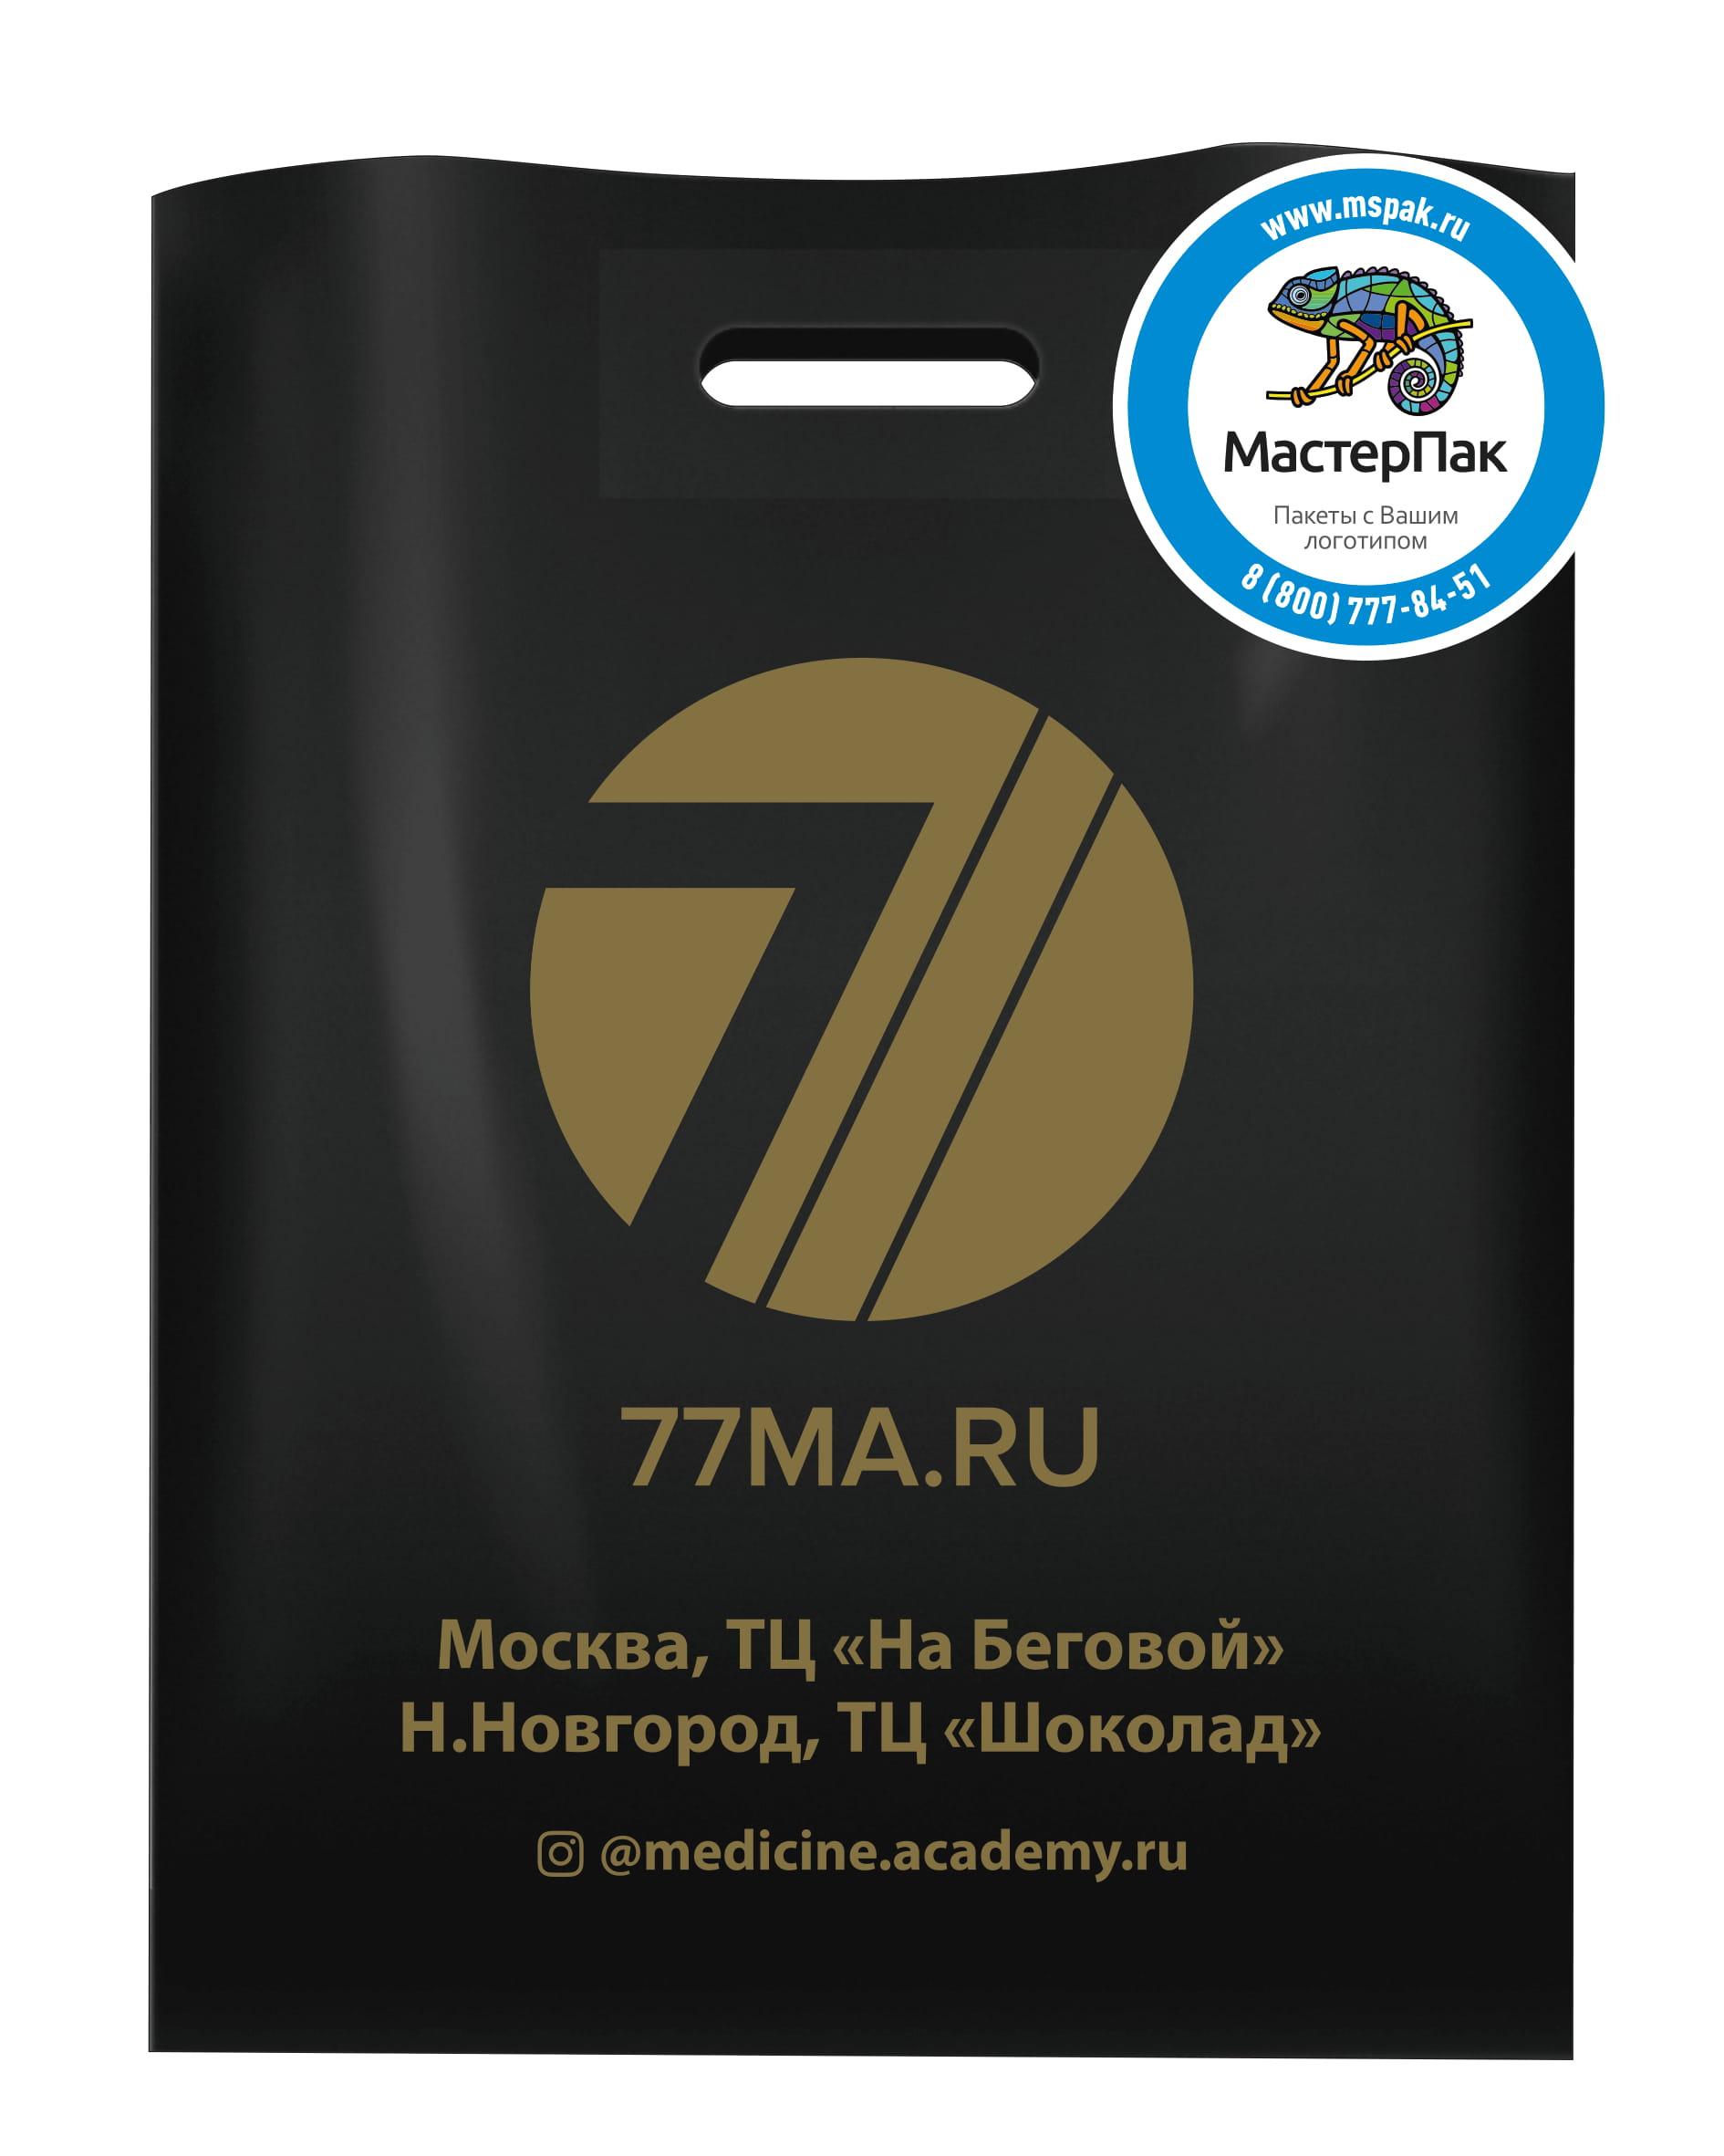 Пакет ПВД с логотипом магазина 77МА.Ru, 70 мкм, 38*50, черный, Москва